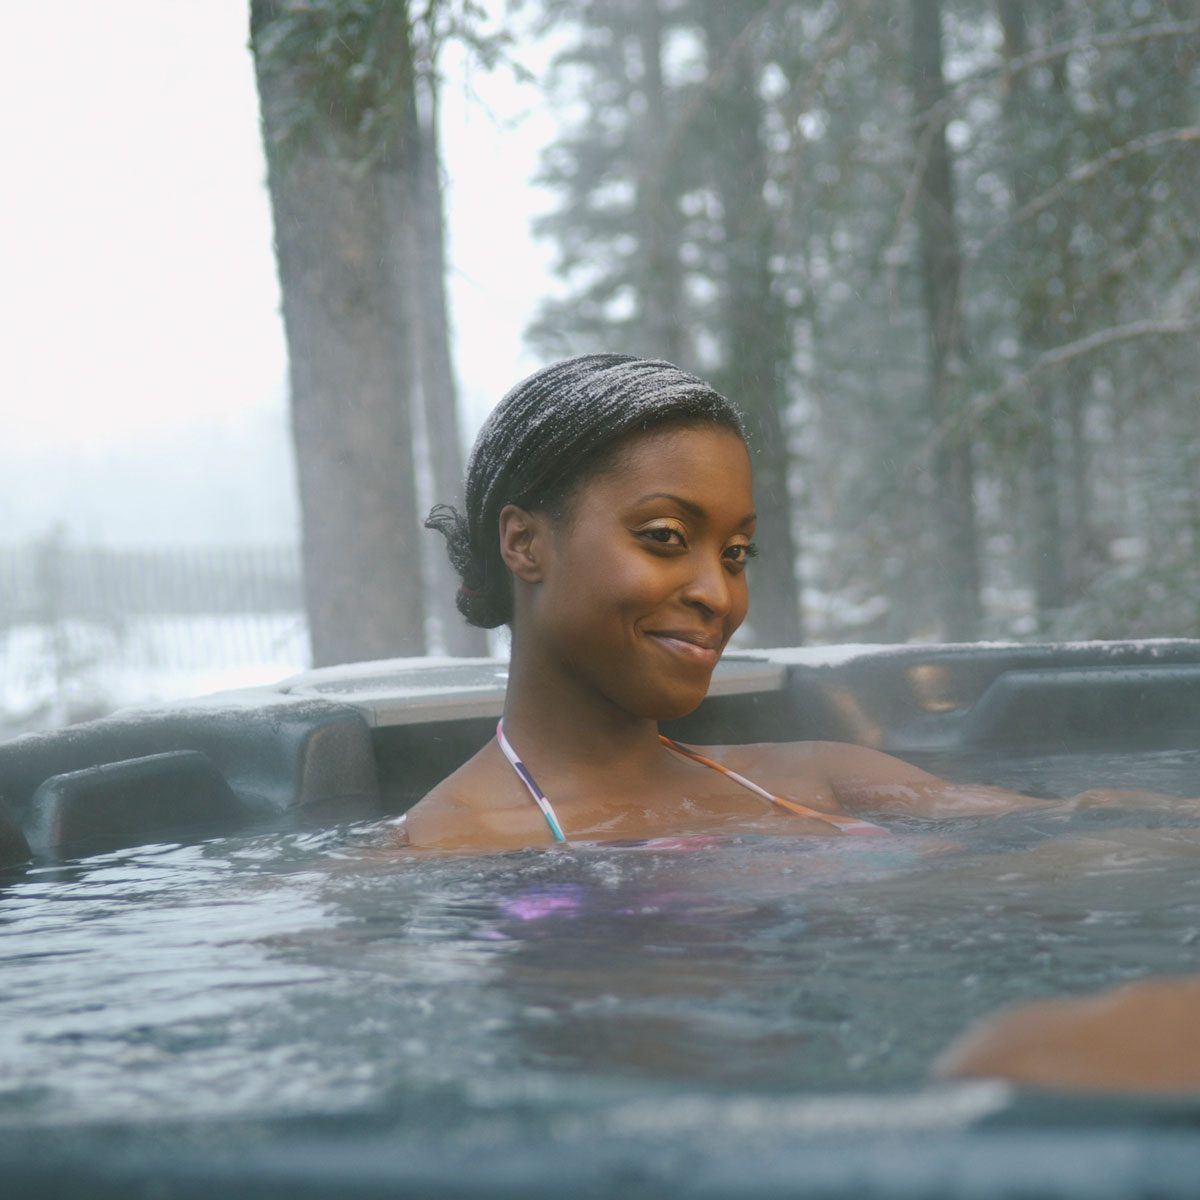 Woman sitting in a hot tub